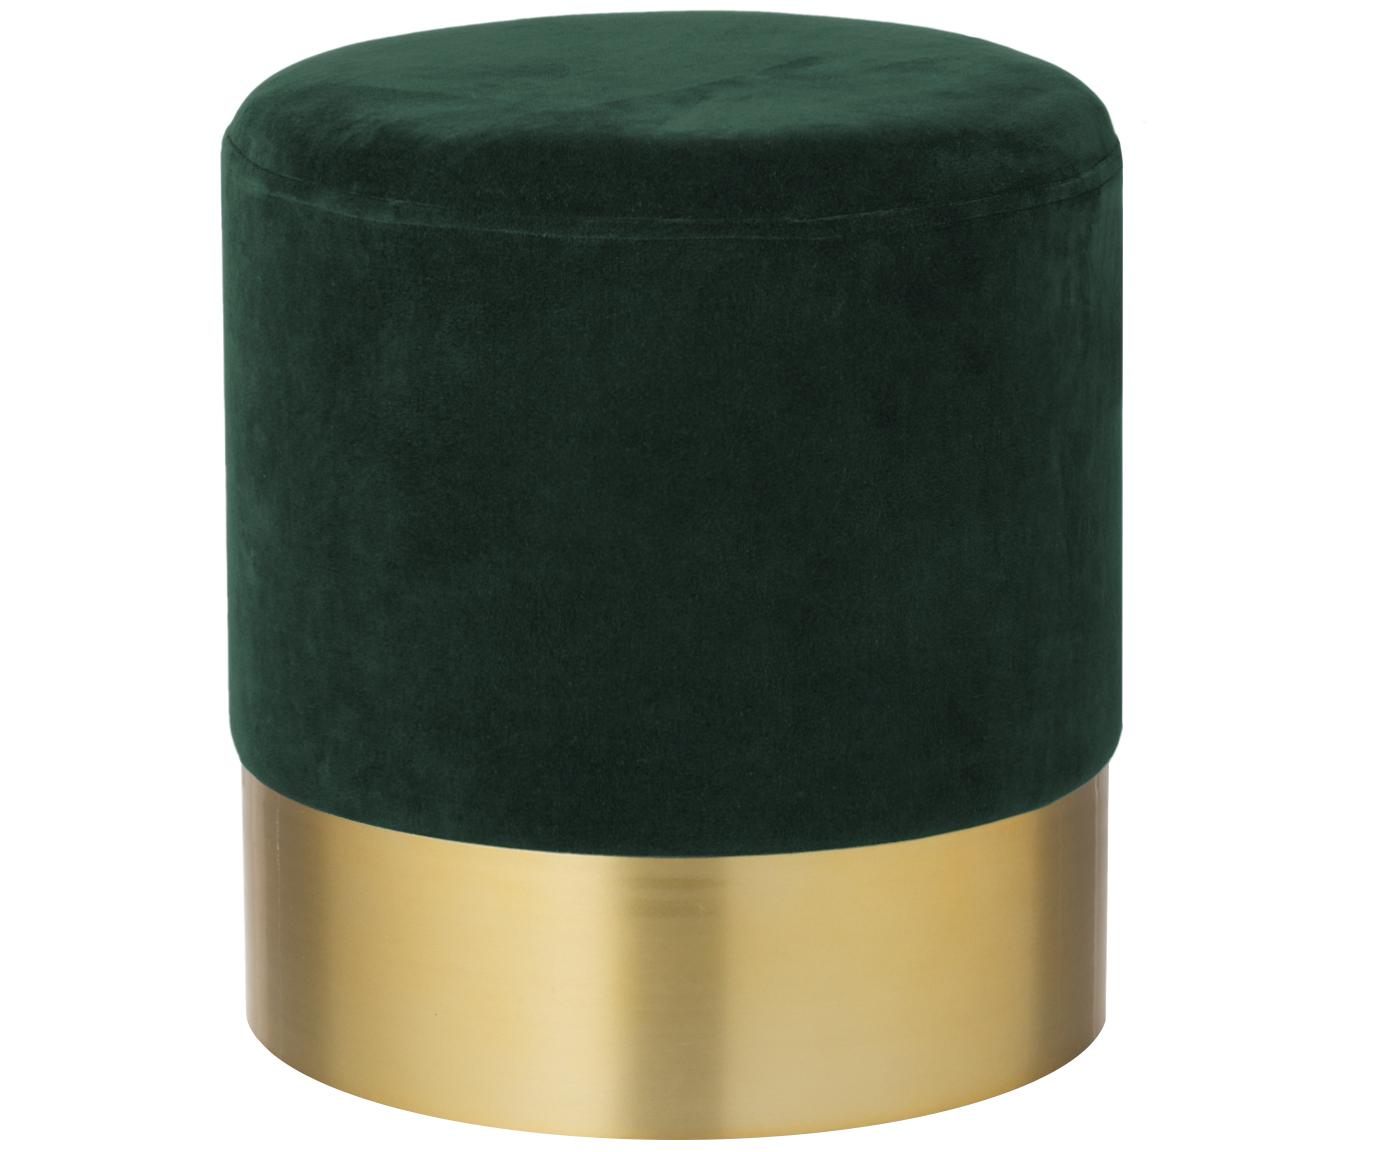 Samt-Hocker Harlow, Bezug: Baumwollsamt, Dunkelgrün, Goldfarben, Ø 38 x H 42 cm